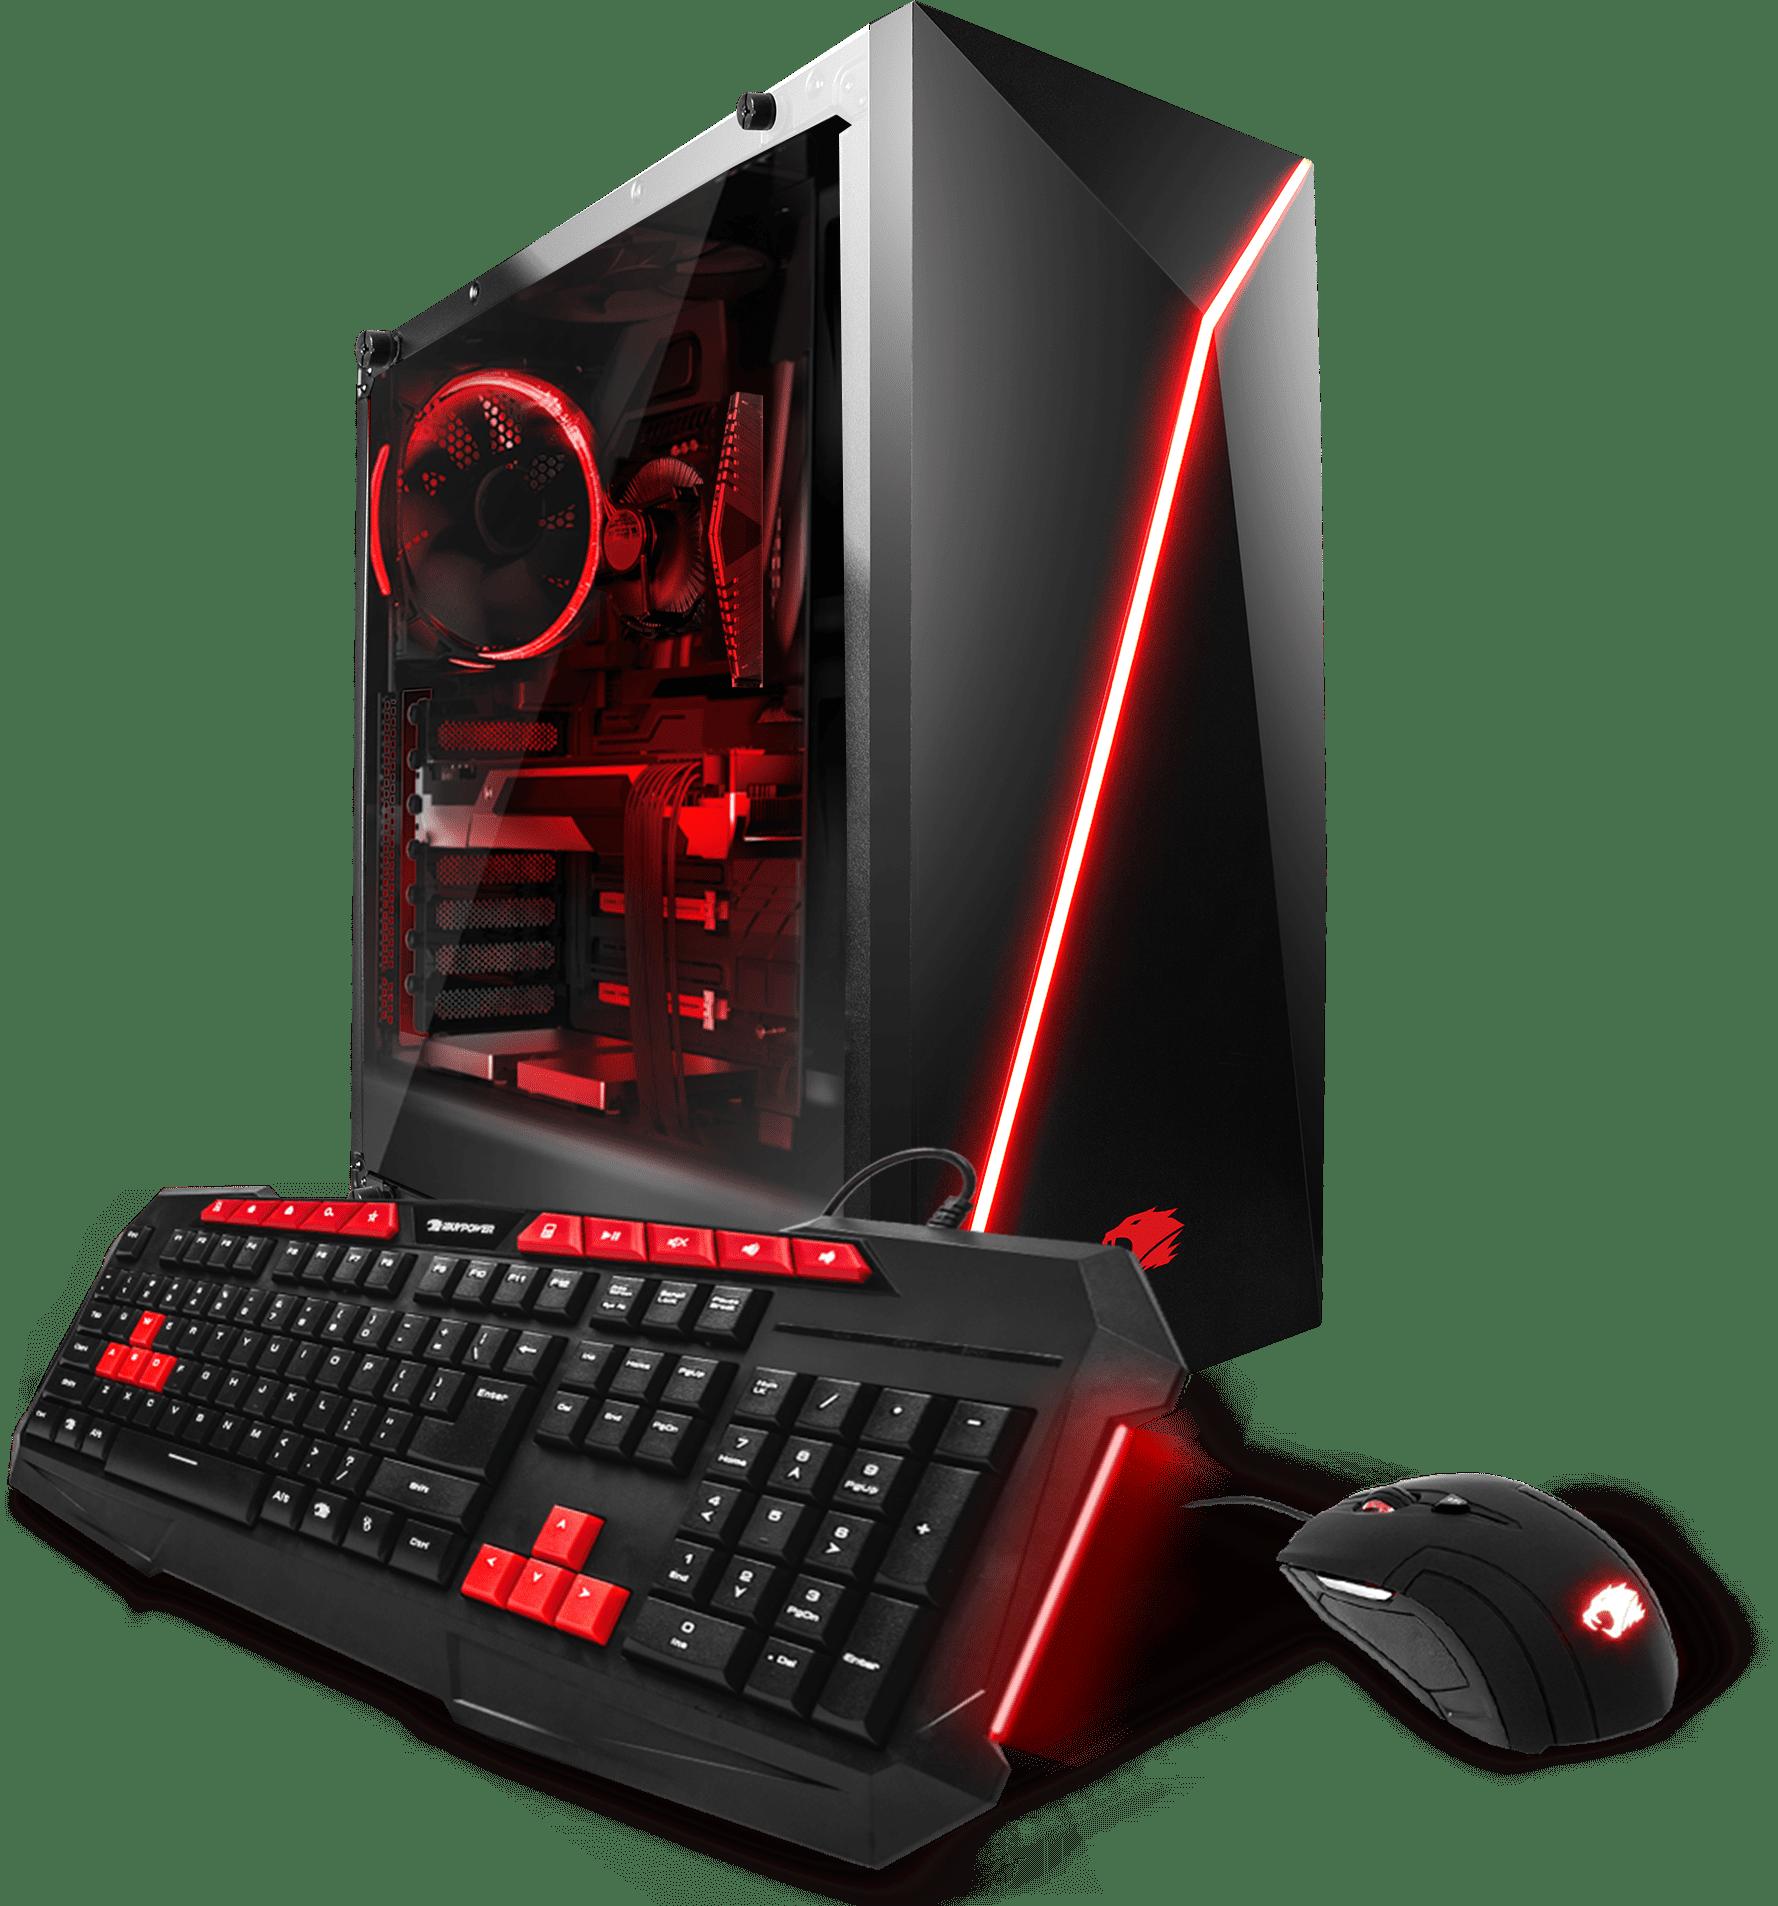 Ibuypower Raven Gamer Wa005a Gaming Desktop Pc With Amd Fx